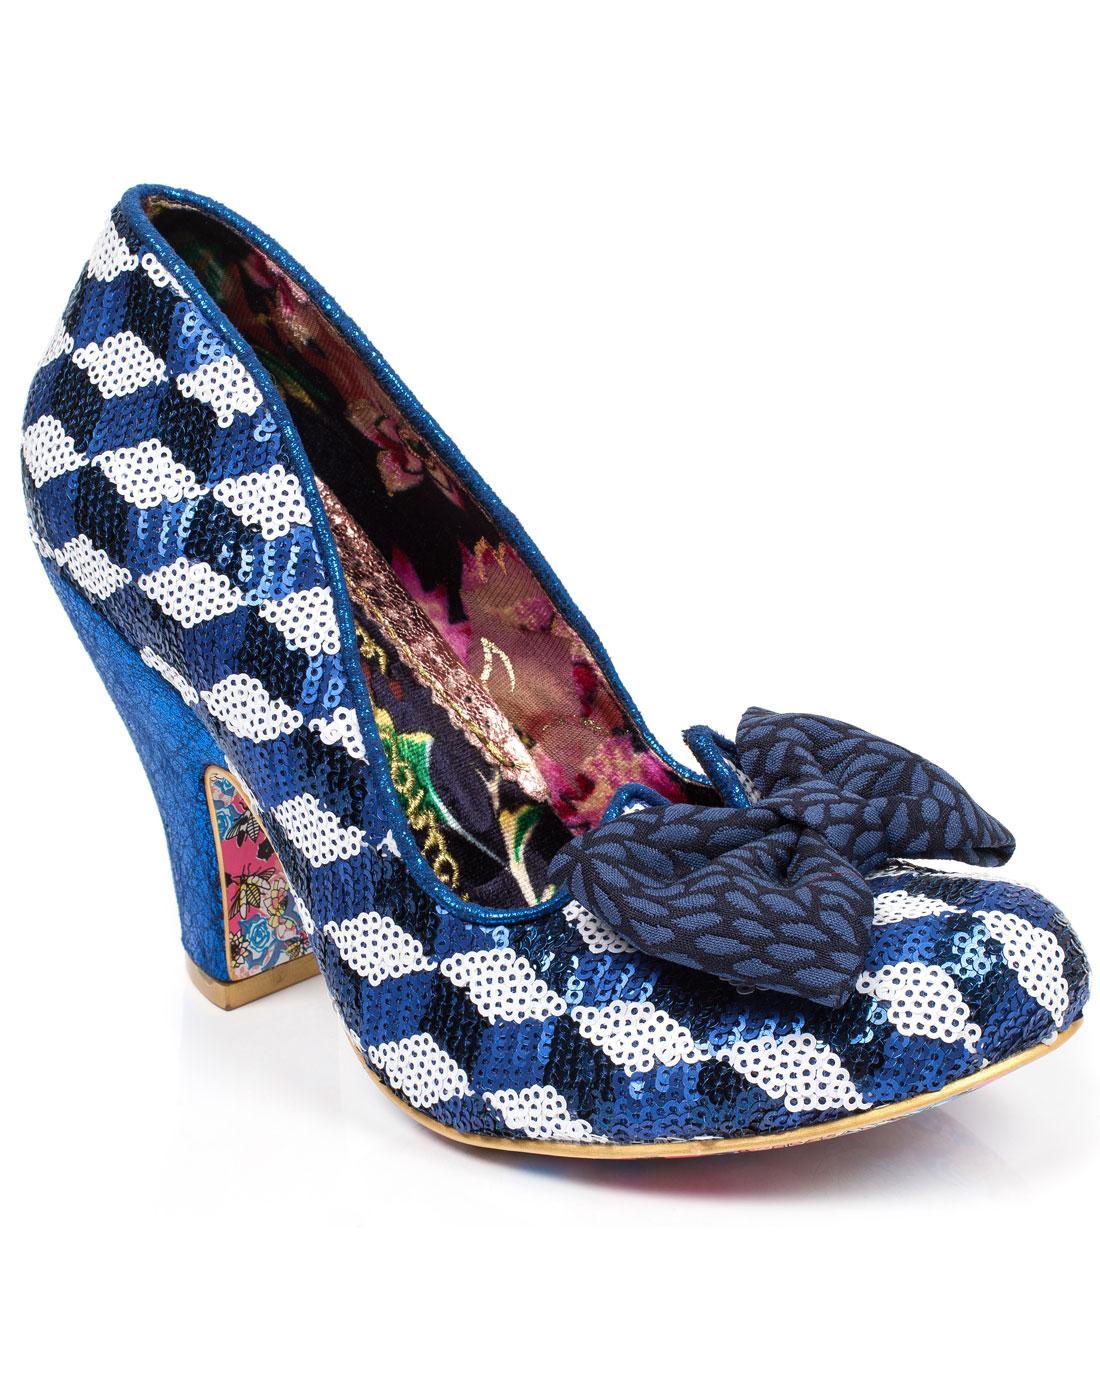 Nick of Time IRREGULAR CHOICE Harlequin Heels BLUE